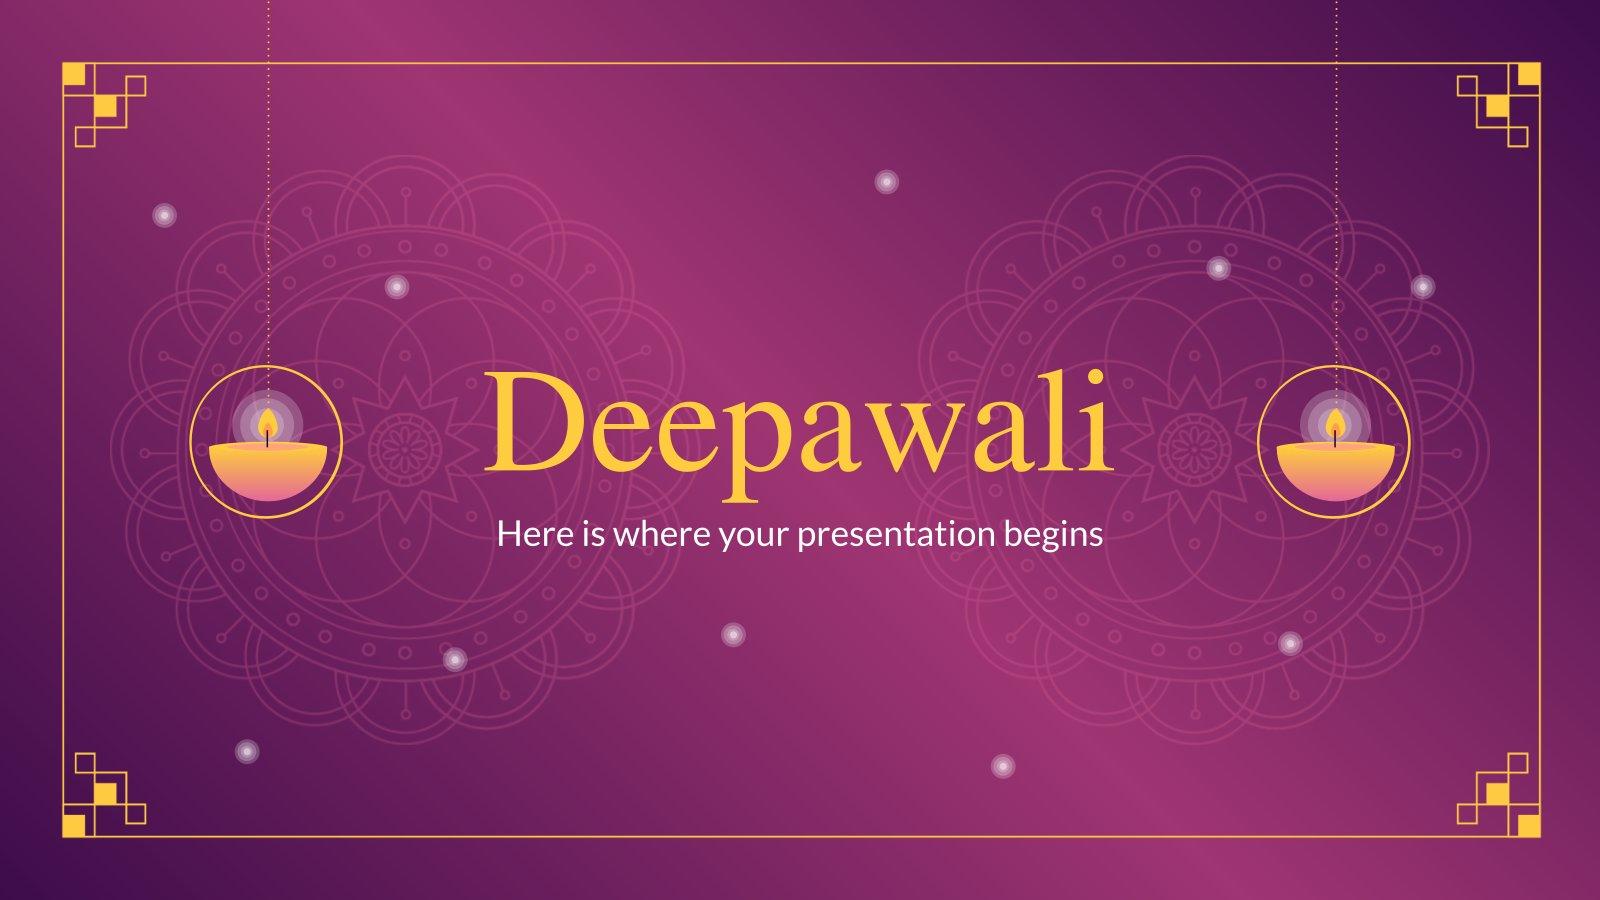 Deepawali Präsentationsvorlage